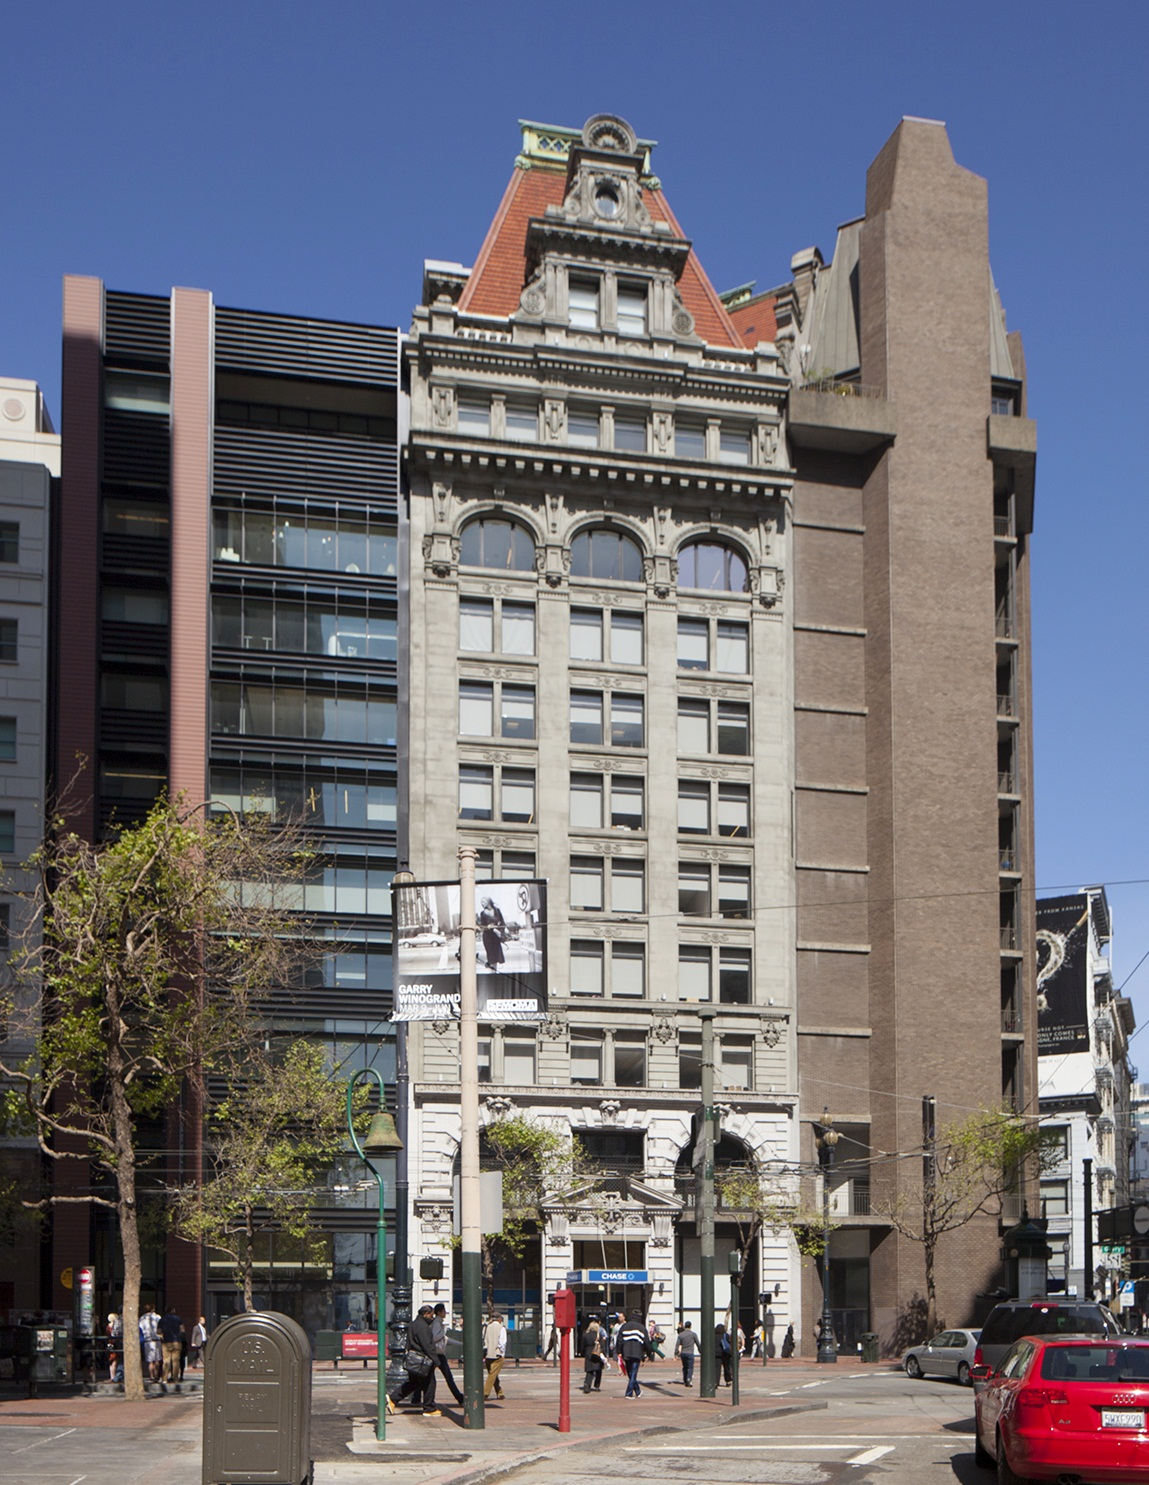 ca_san francisco county_mutual savings bank building.jpg